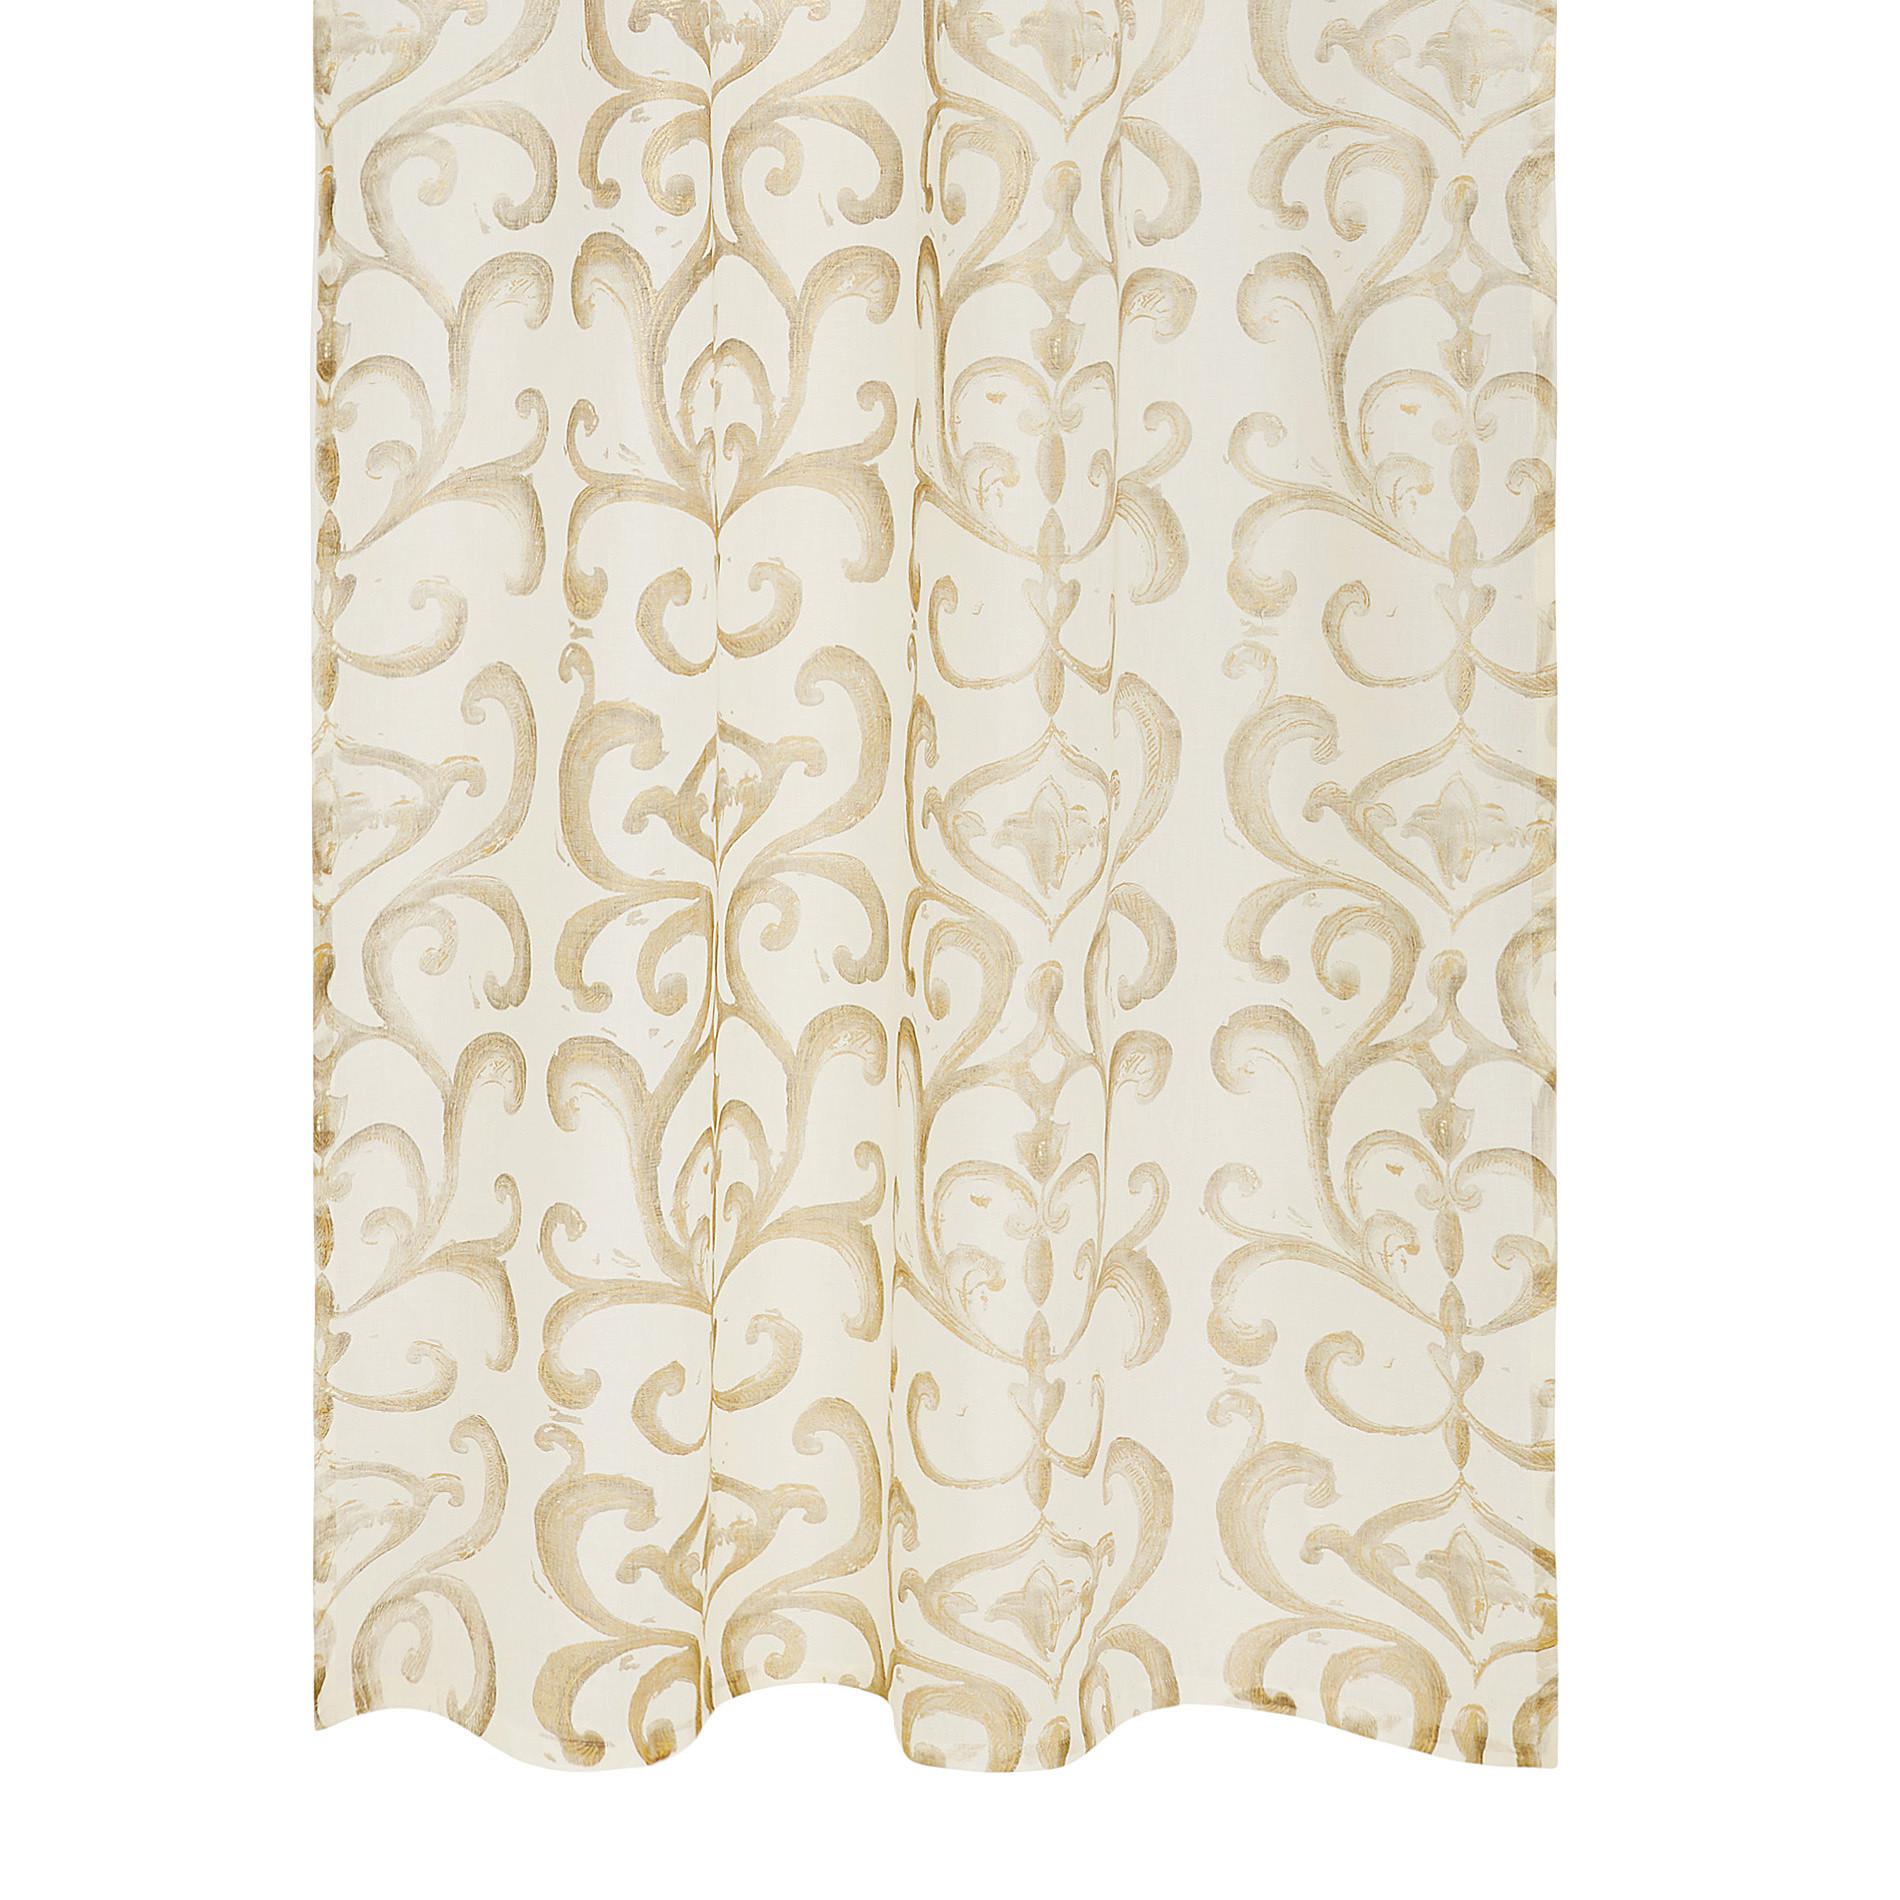 Tenda puro lino stampa devore, Bianco/Oro, large image number 0